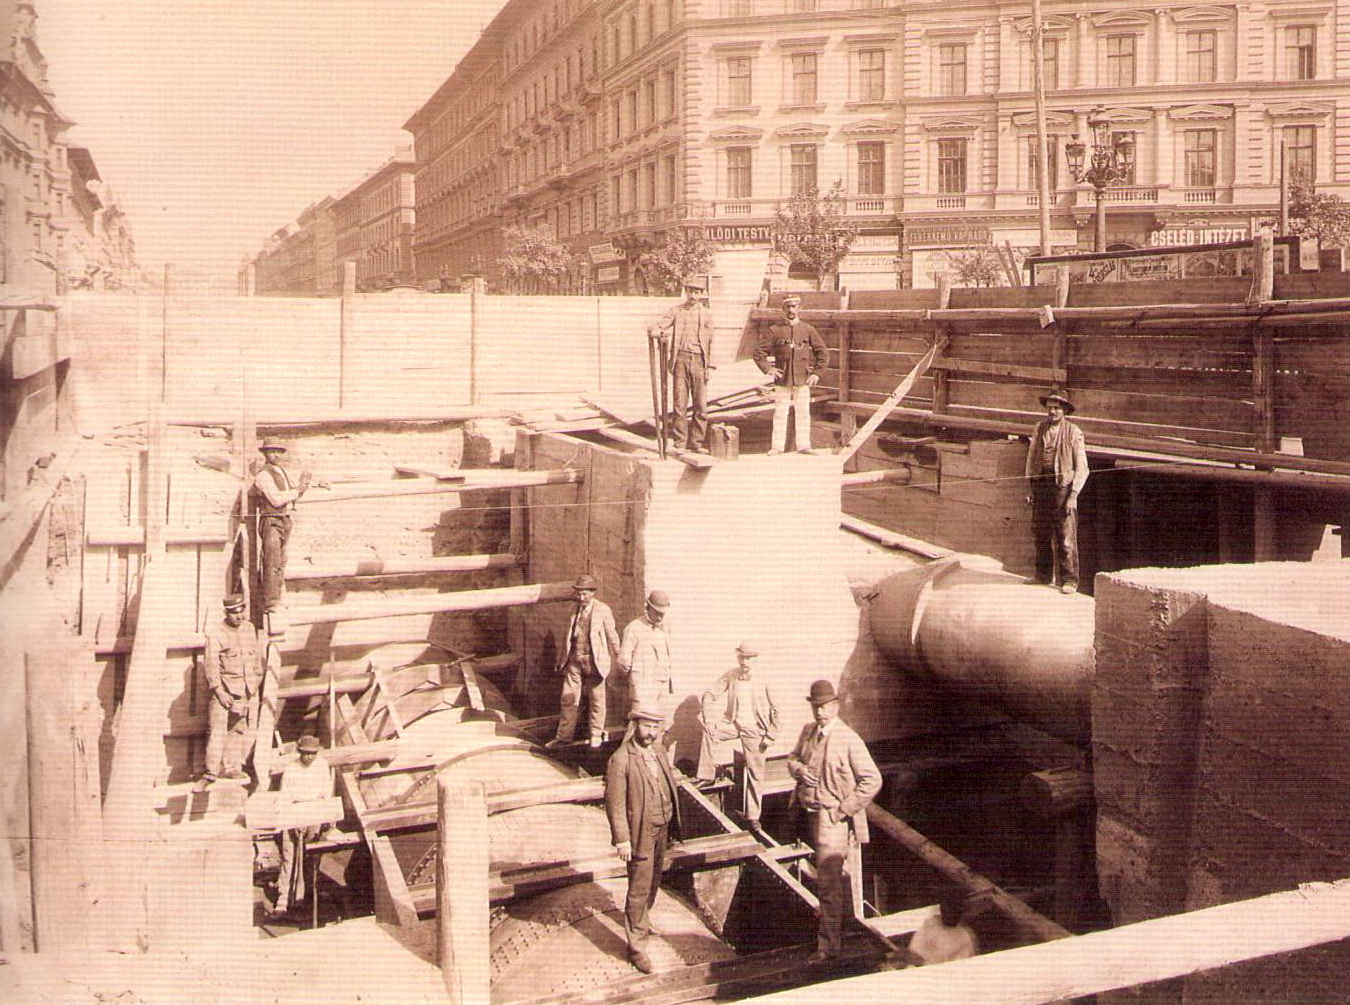 foldalatti-1895korul-oktogonnalfogyujtocsatorna-kloszgyorgyfelvetele.jpg